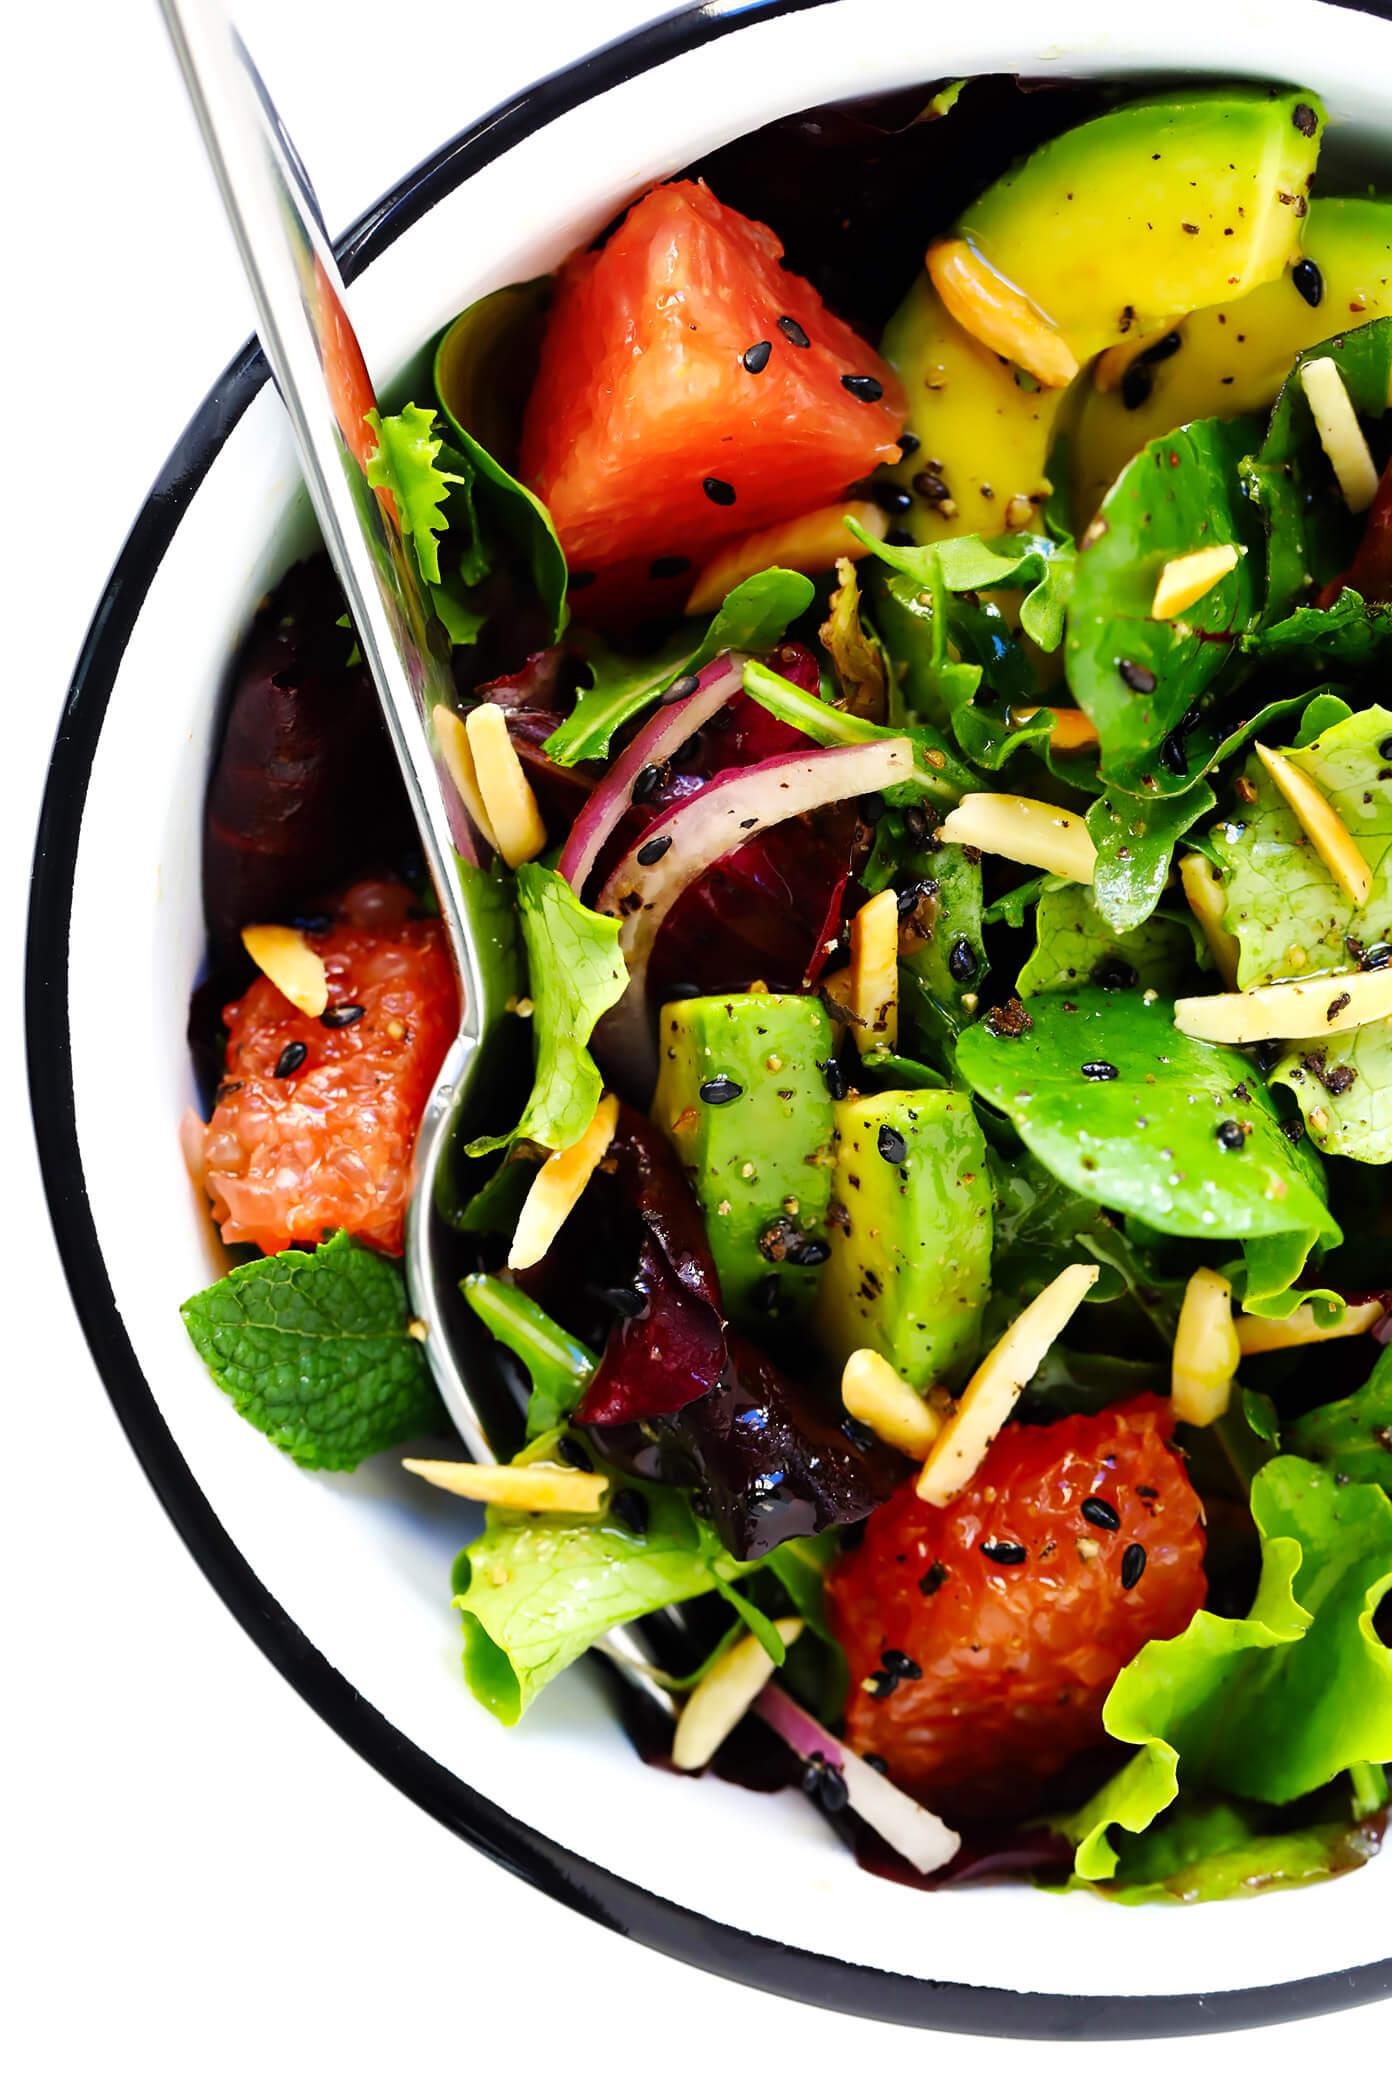 Sunshine Sesame Grapefruit Avocado Salad with Mint and Basil